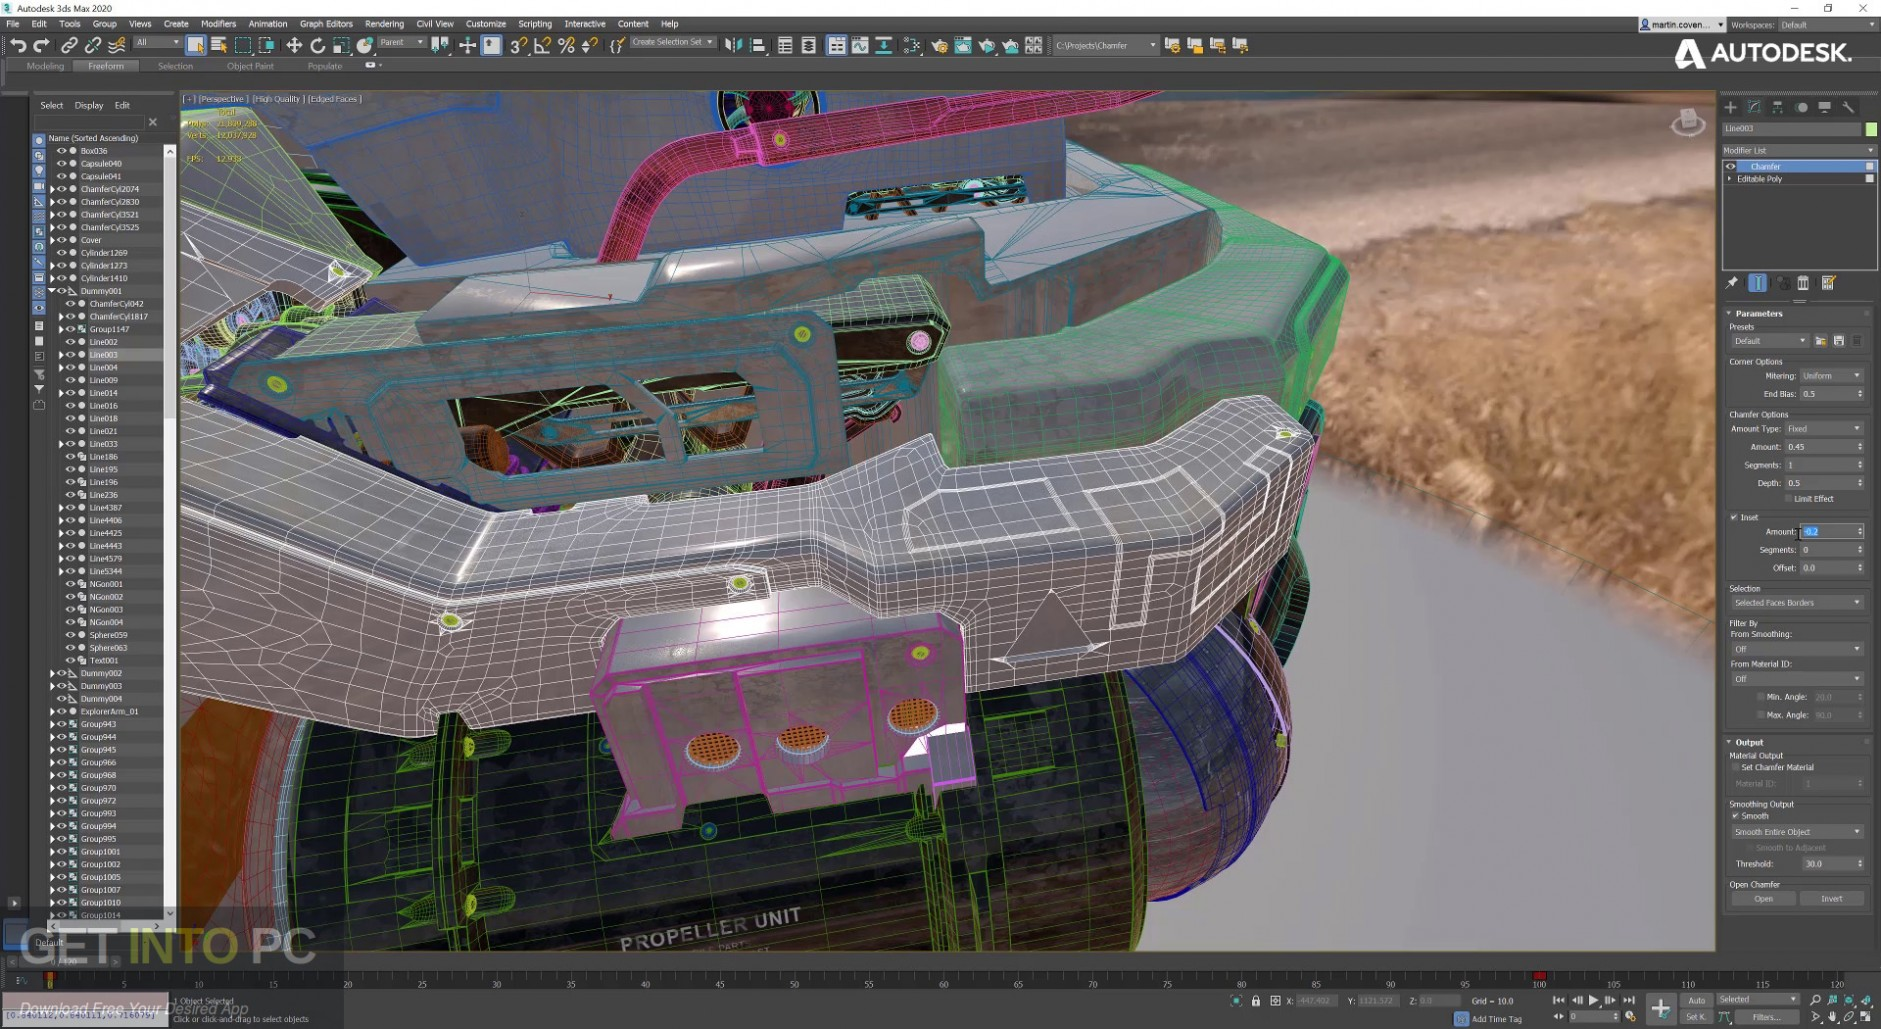 Autodesk 3ds Max 2020 Direct Link Download-GetintoPC.com